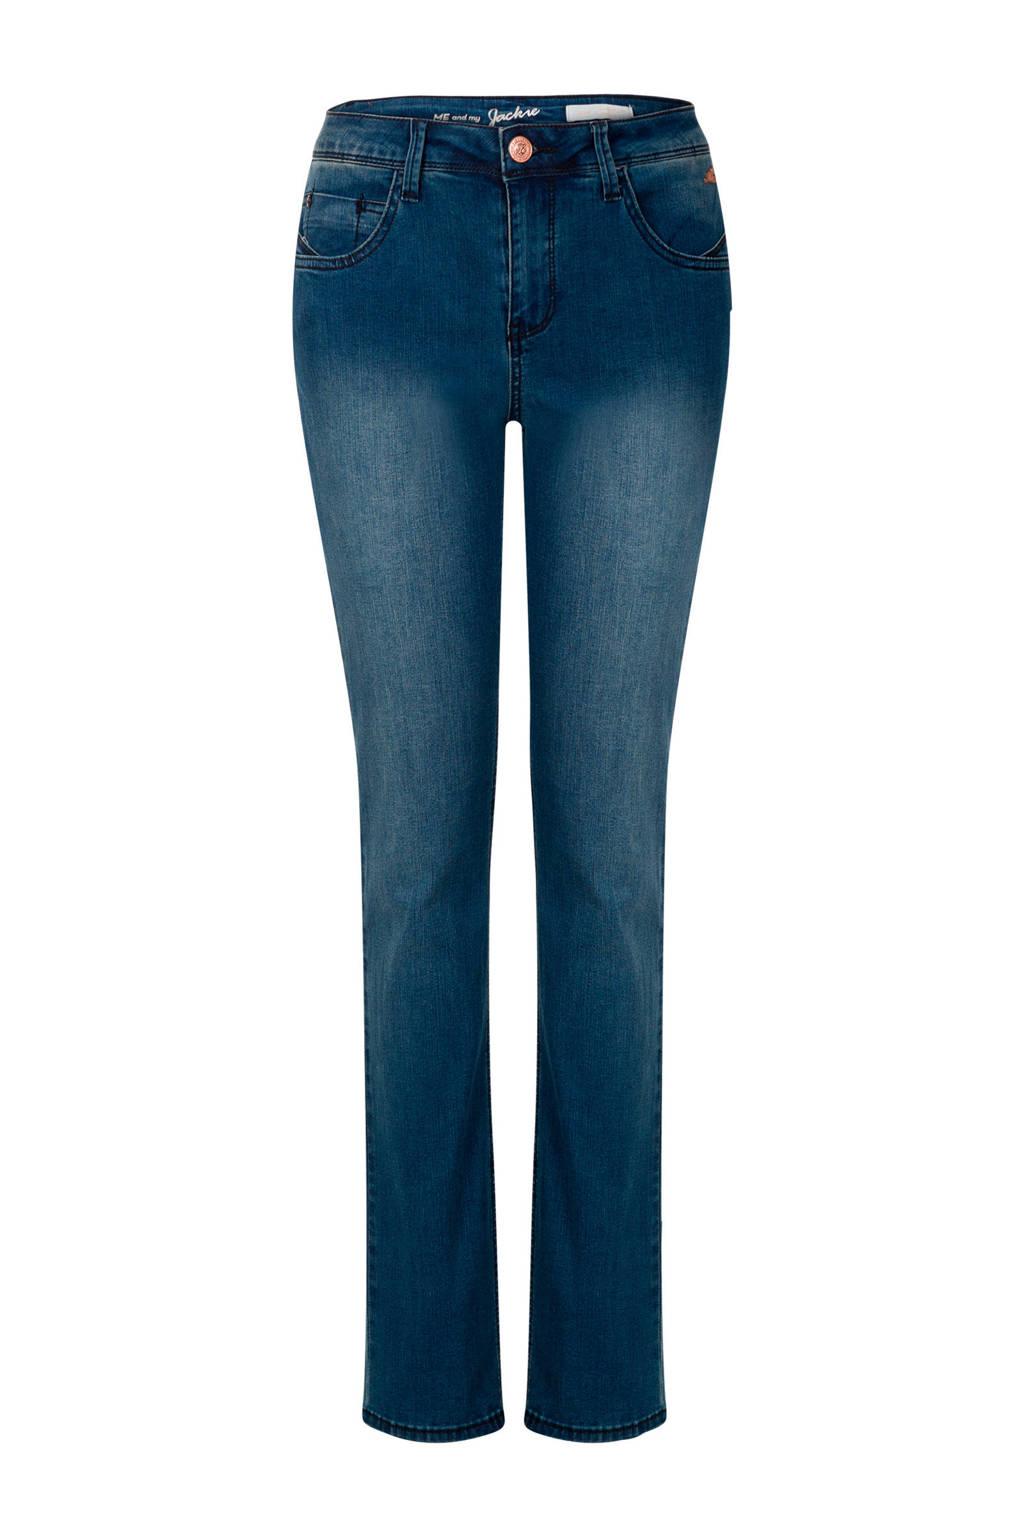 Miss Etam Regulier slim fit jeans Jackie blauw, Blauw